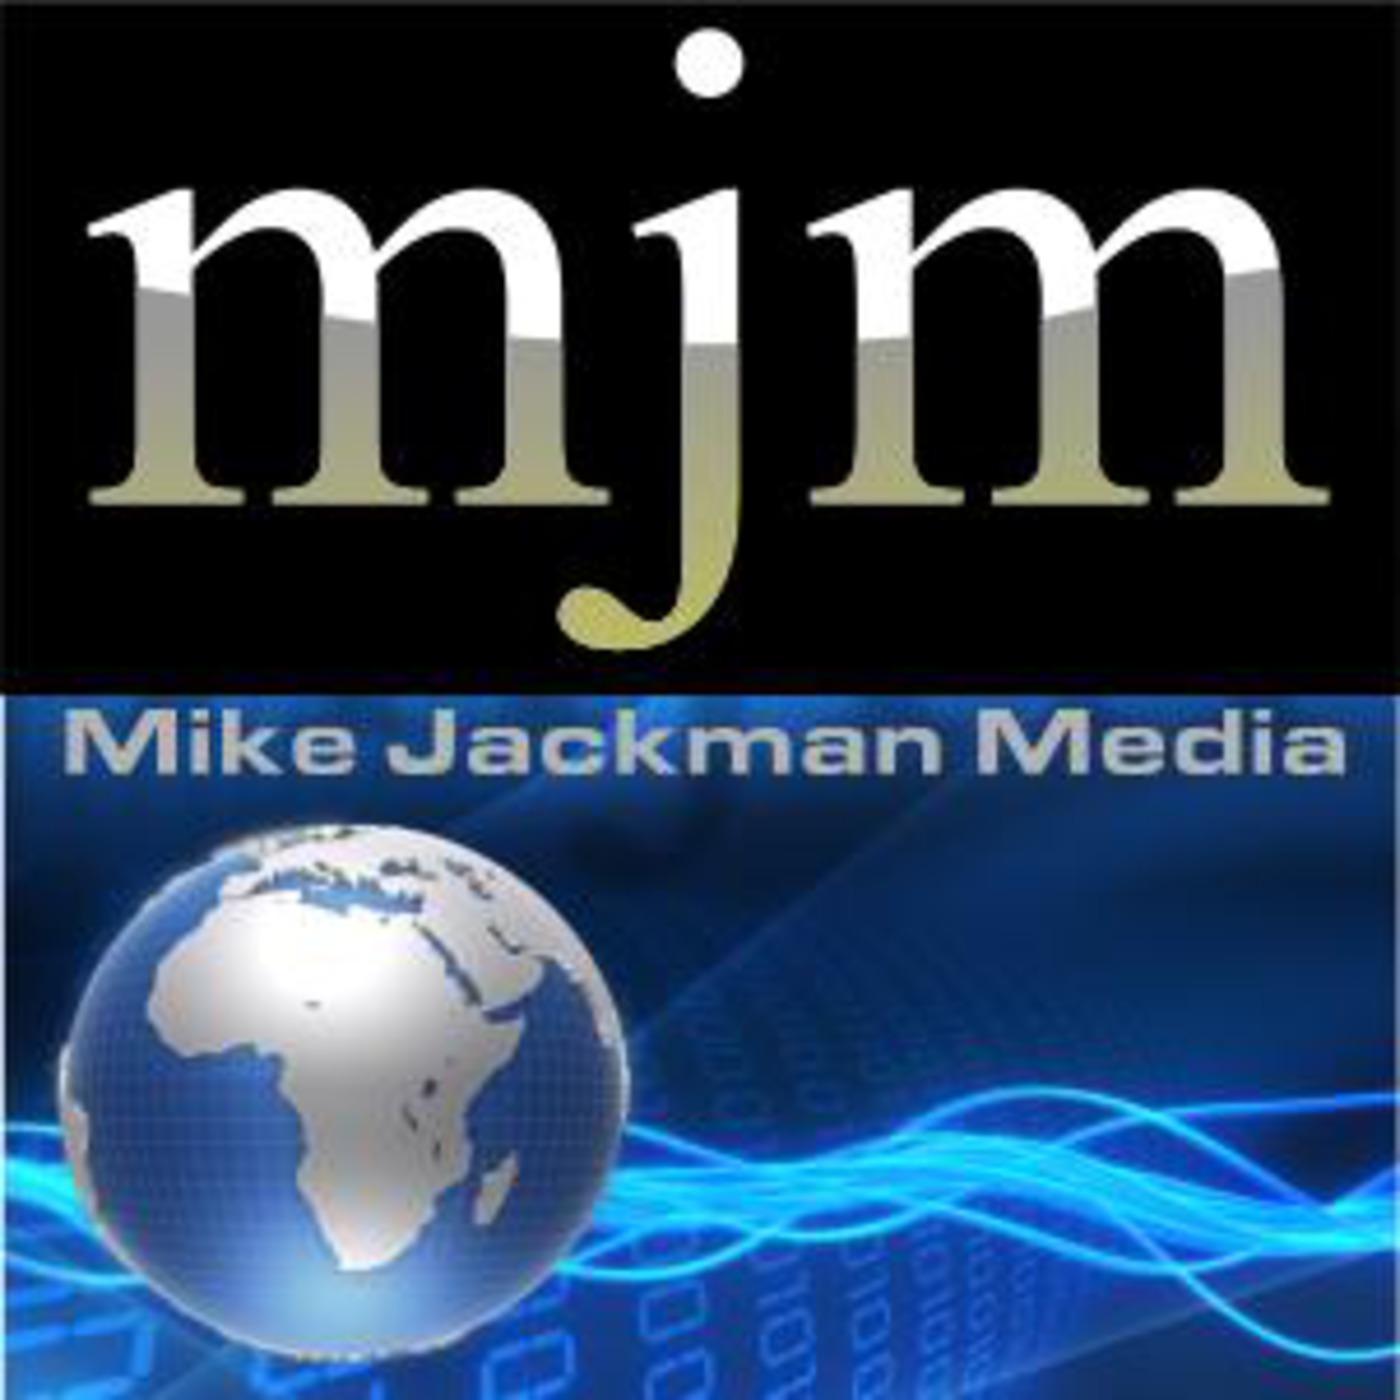 MIKE JACKMAN MEDIA